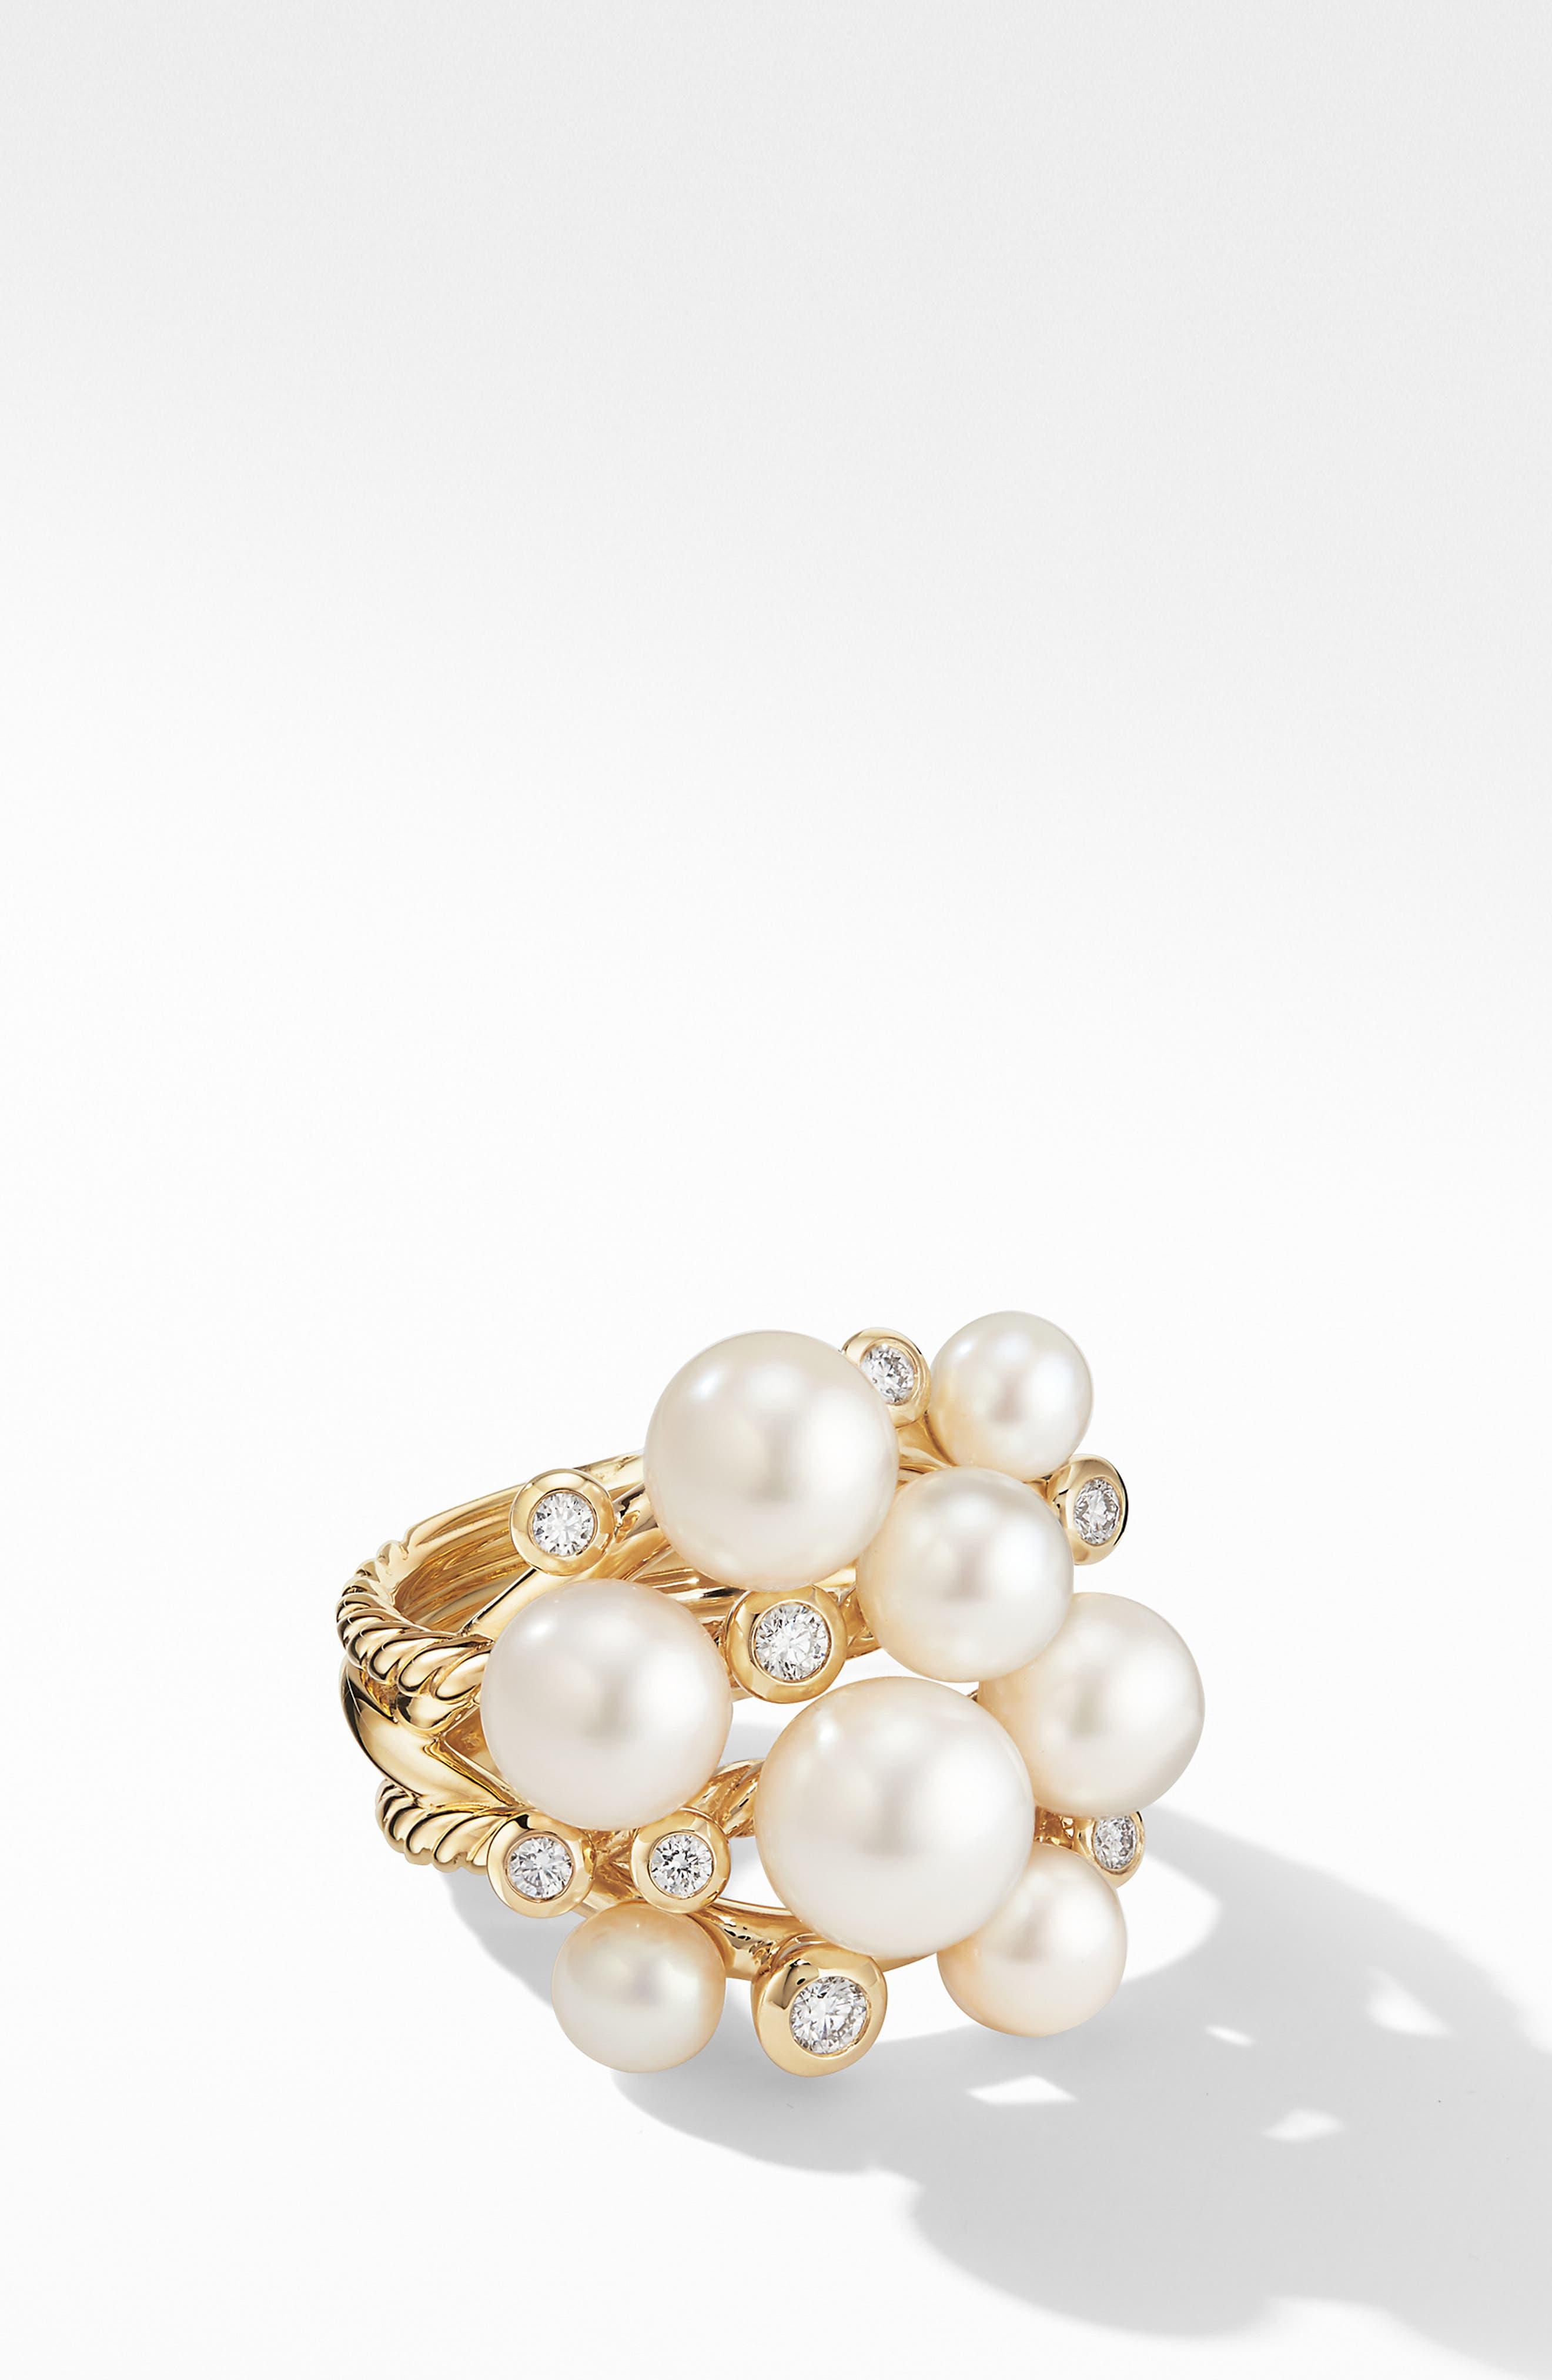 DAVID YURMAN Large Pearl Cluster Ring with Diamonds, Main, color, YELLOW GOLD/ DIAMOND/ PEARL